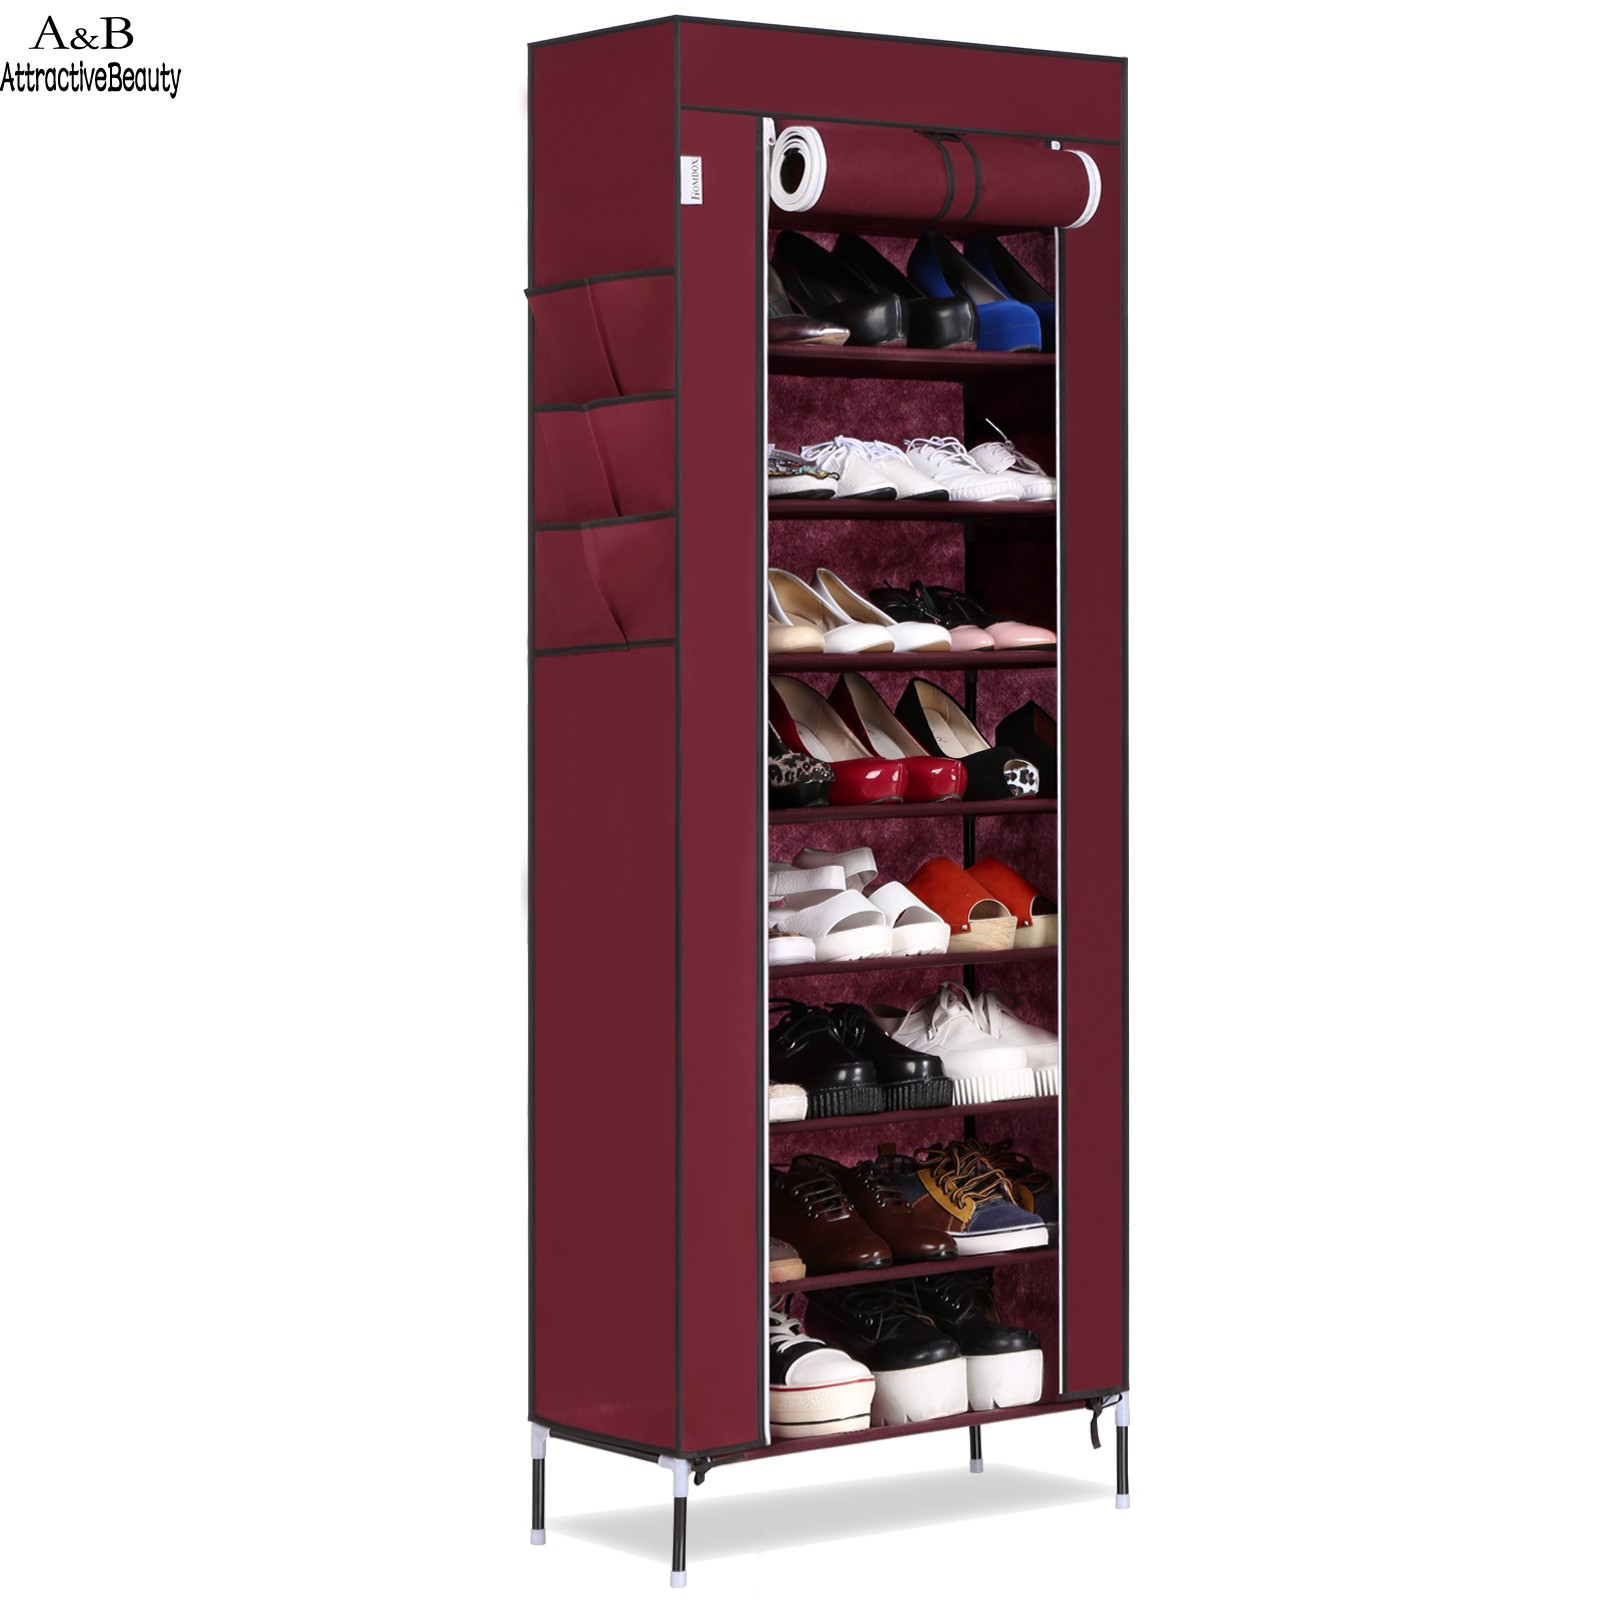 Homdox Shoe Cabinet Shoes Racks Storage Large Capacity Home Furniture Diy Simple Portable Shoe Rack Organizer N20*